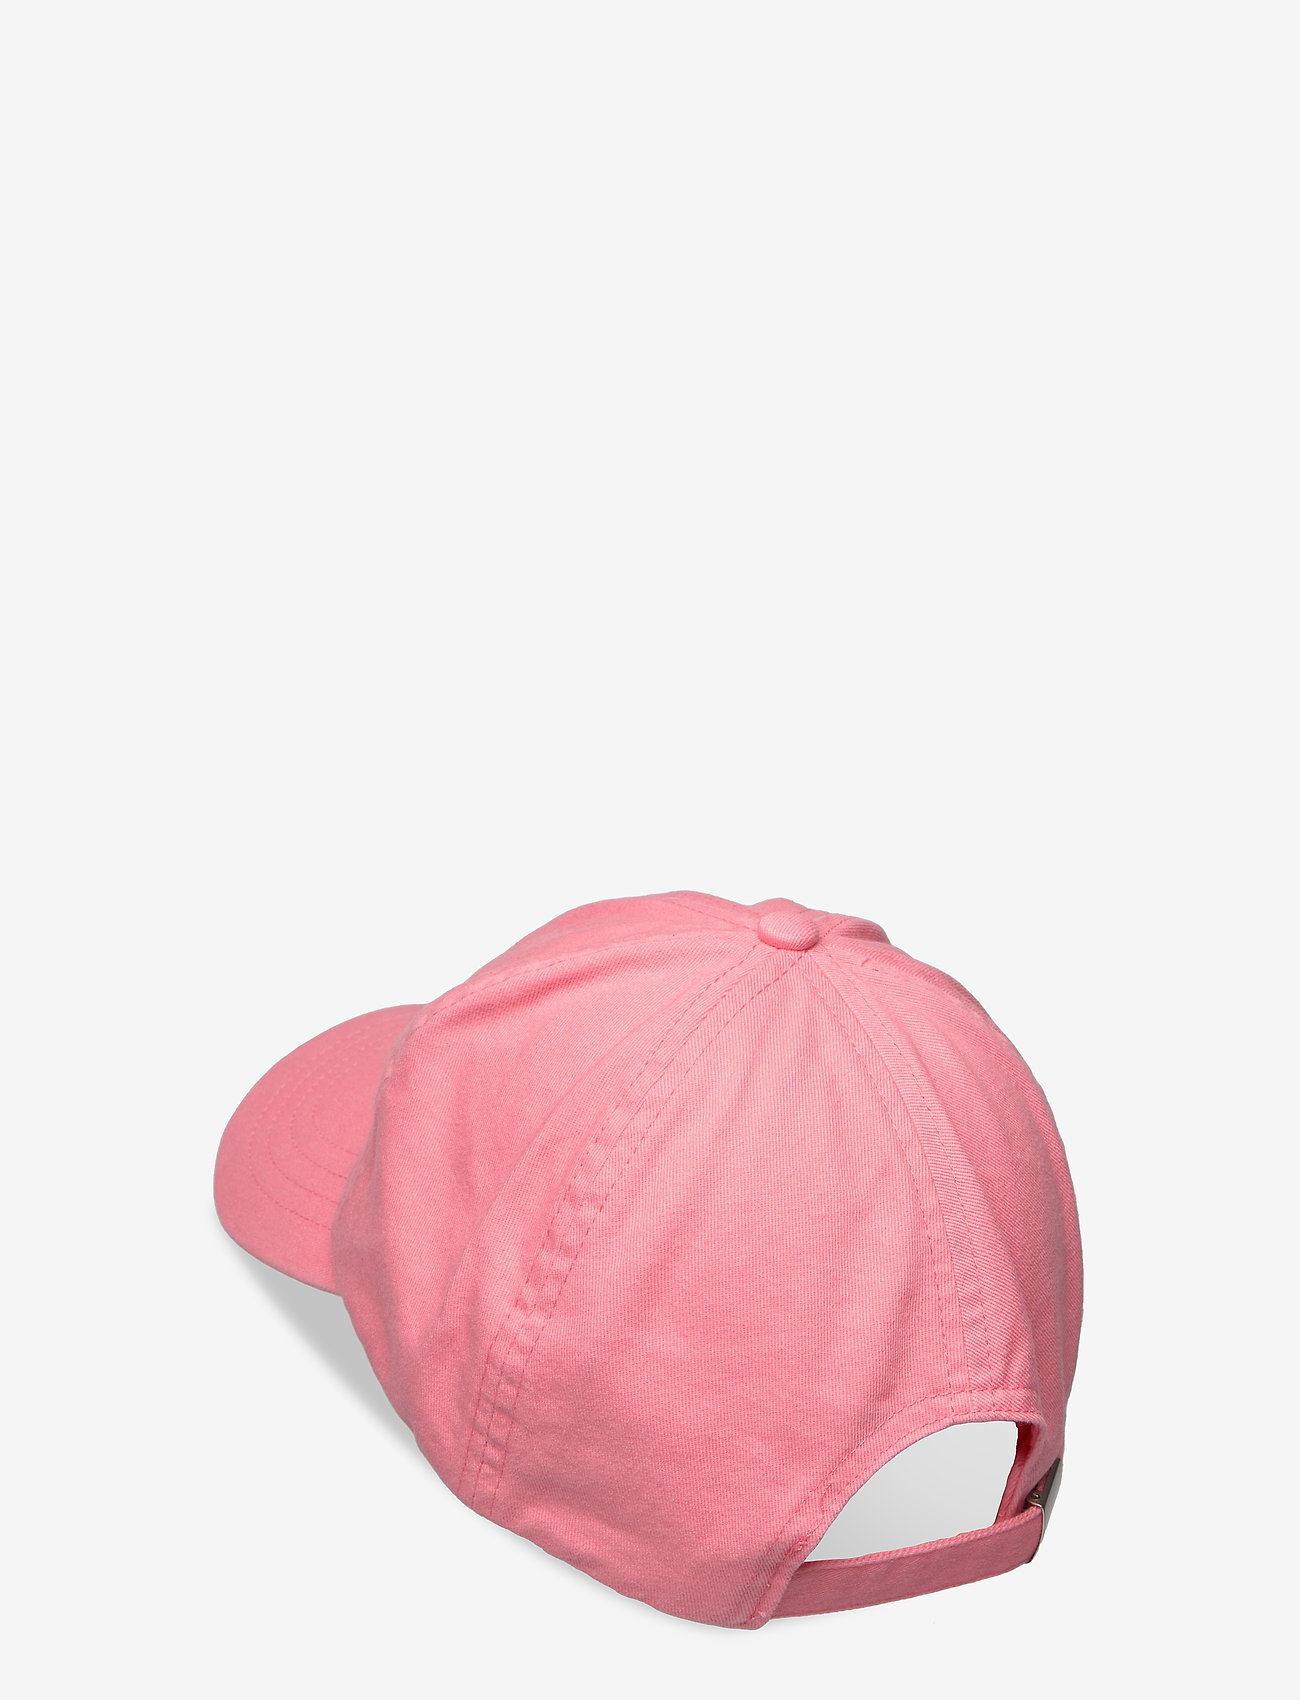 Billabong - ESSENTIAL CAP - kasketter - gypsy pink - 1